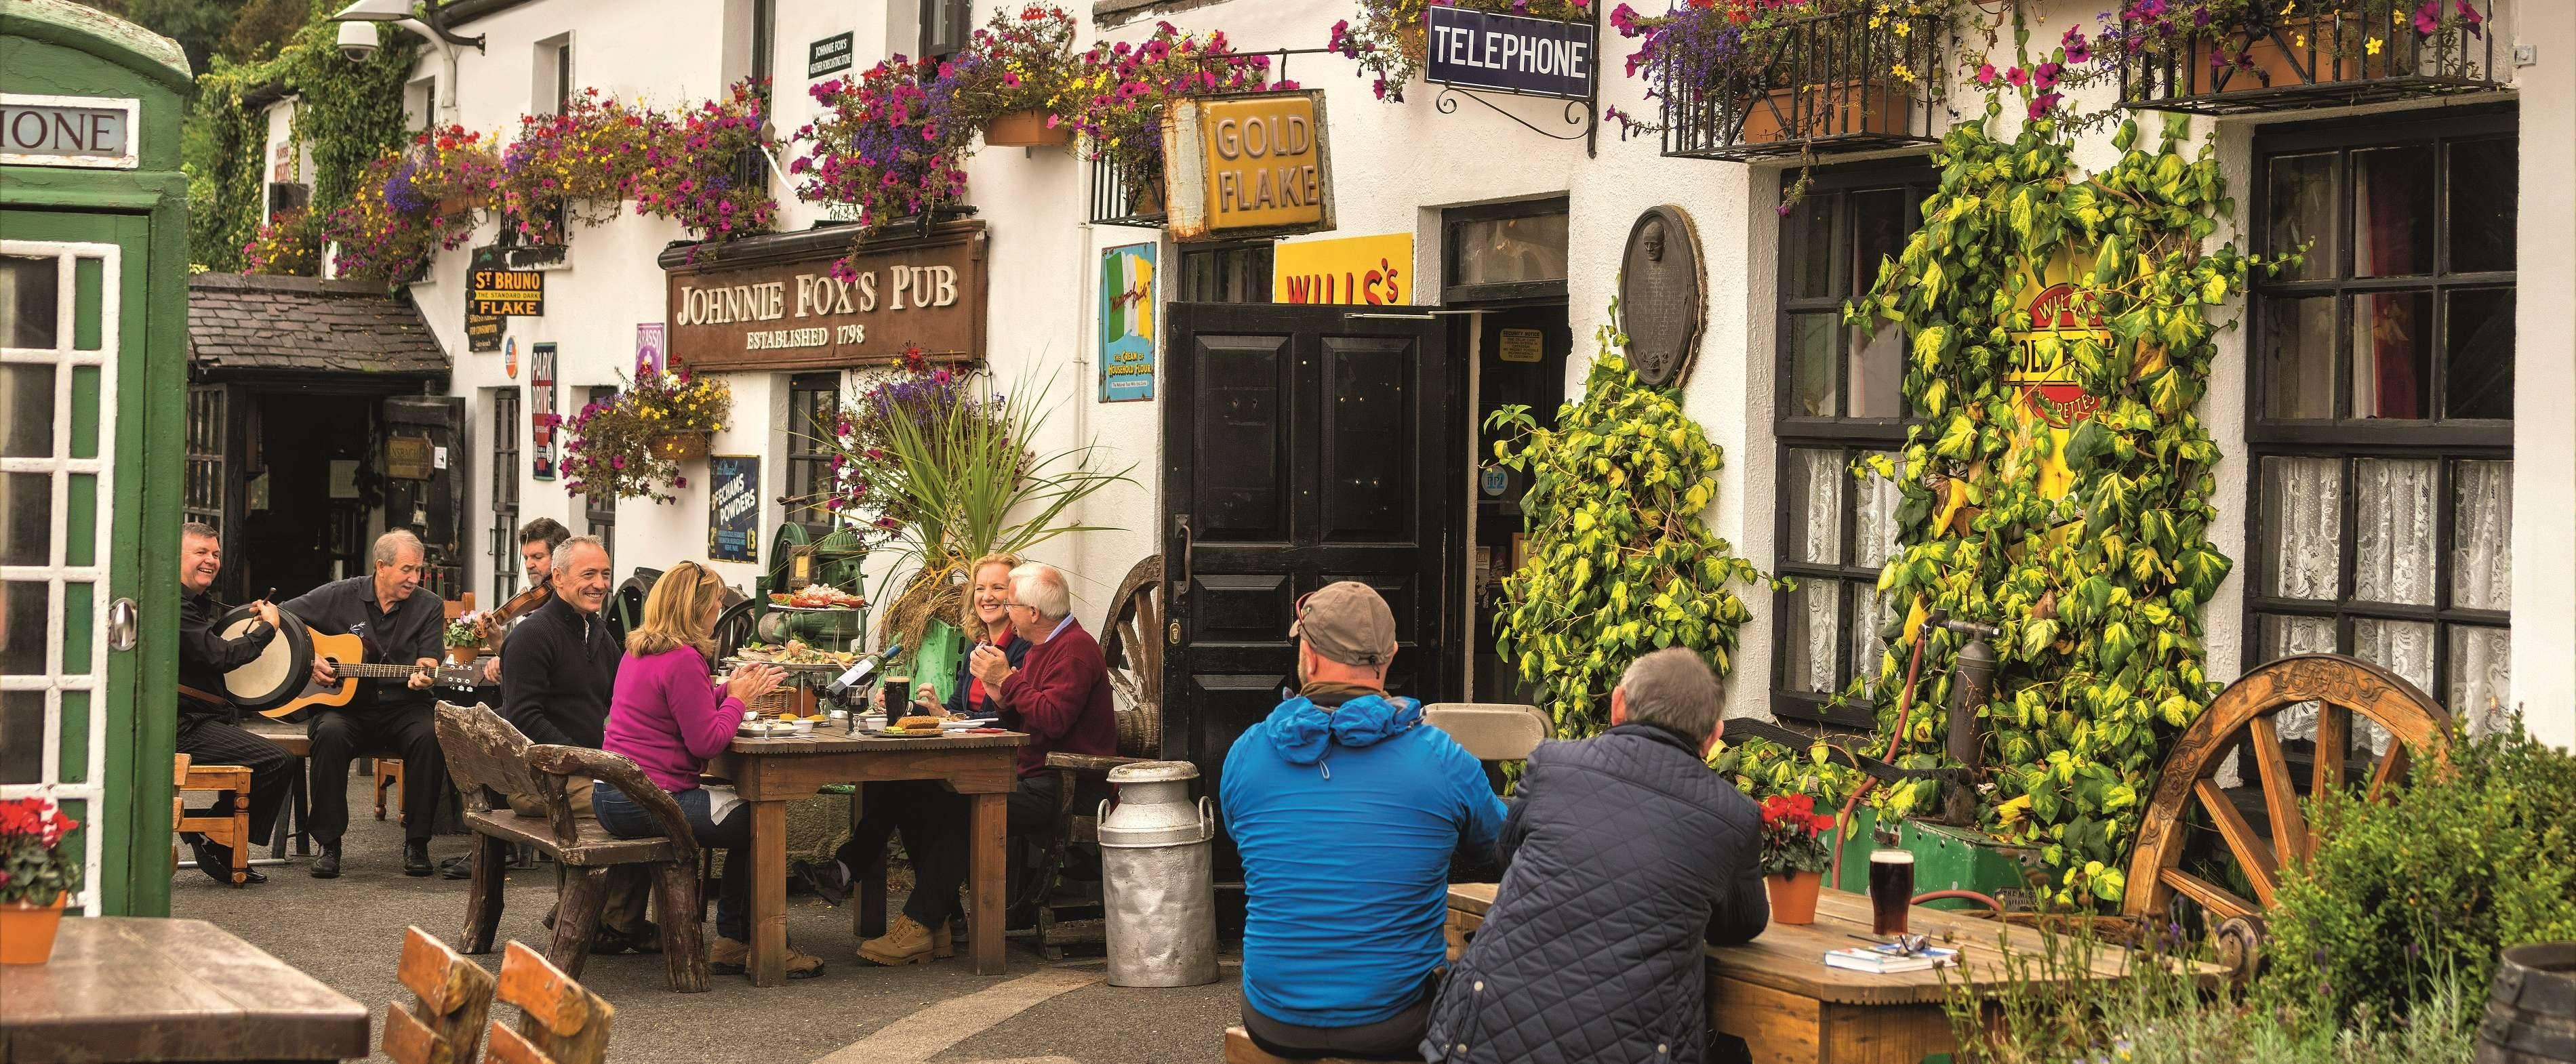 Irland - Dublin - Johnnie Foxs Pub